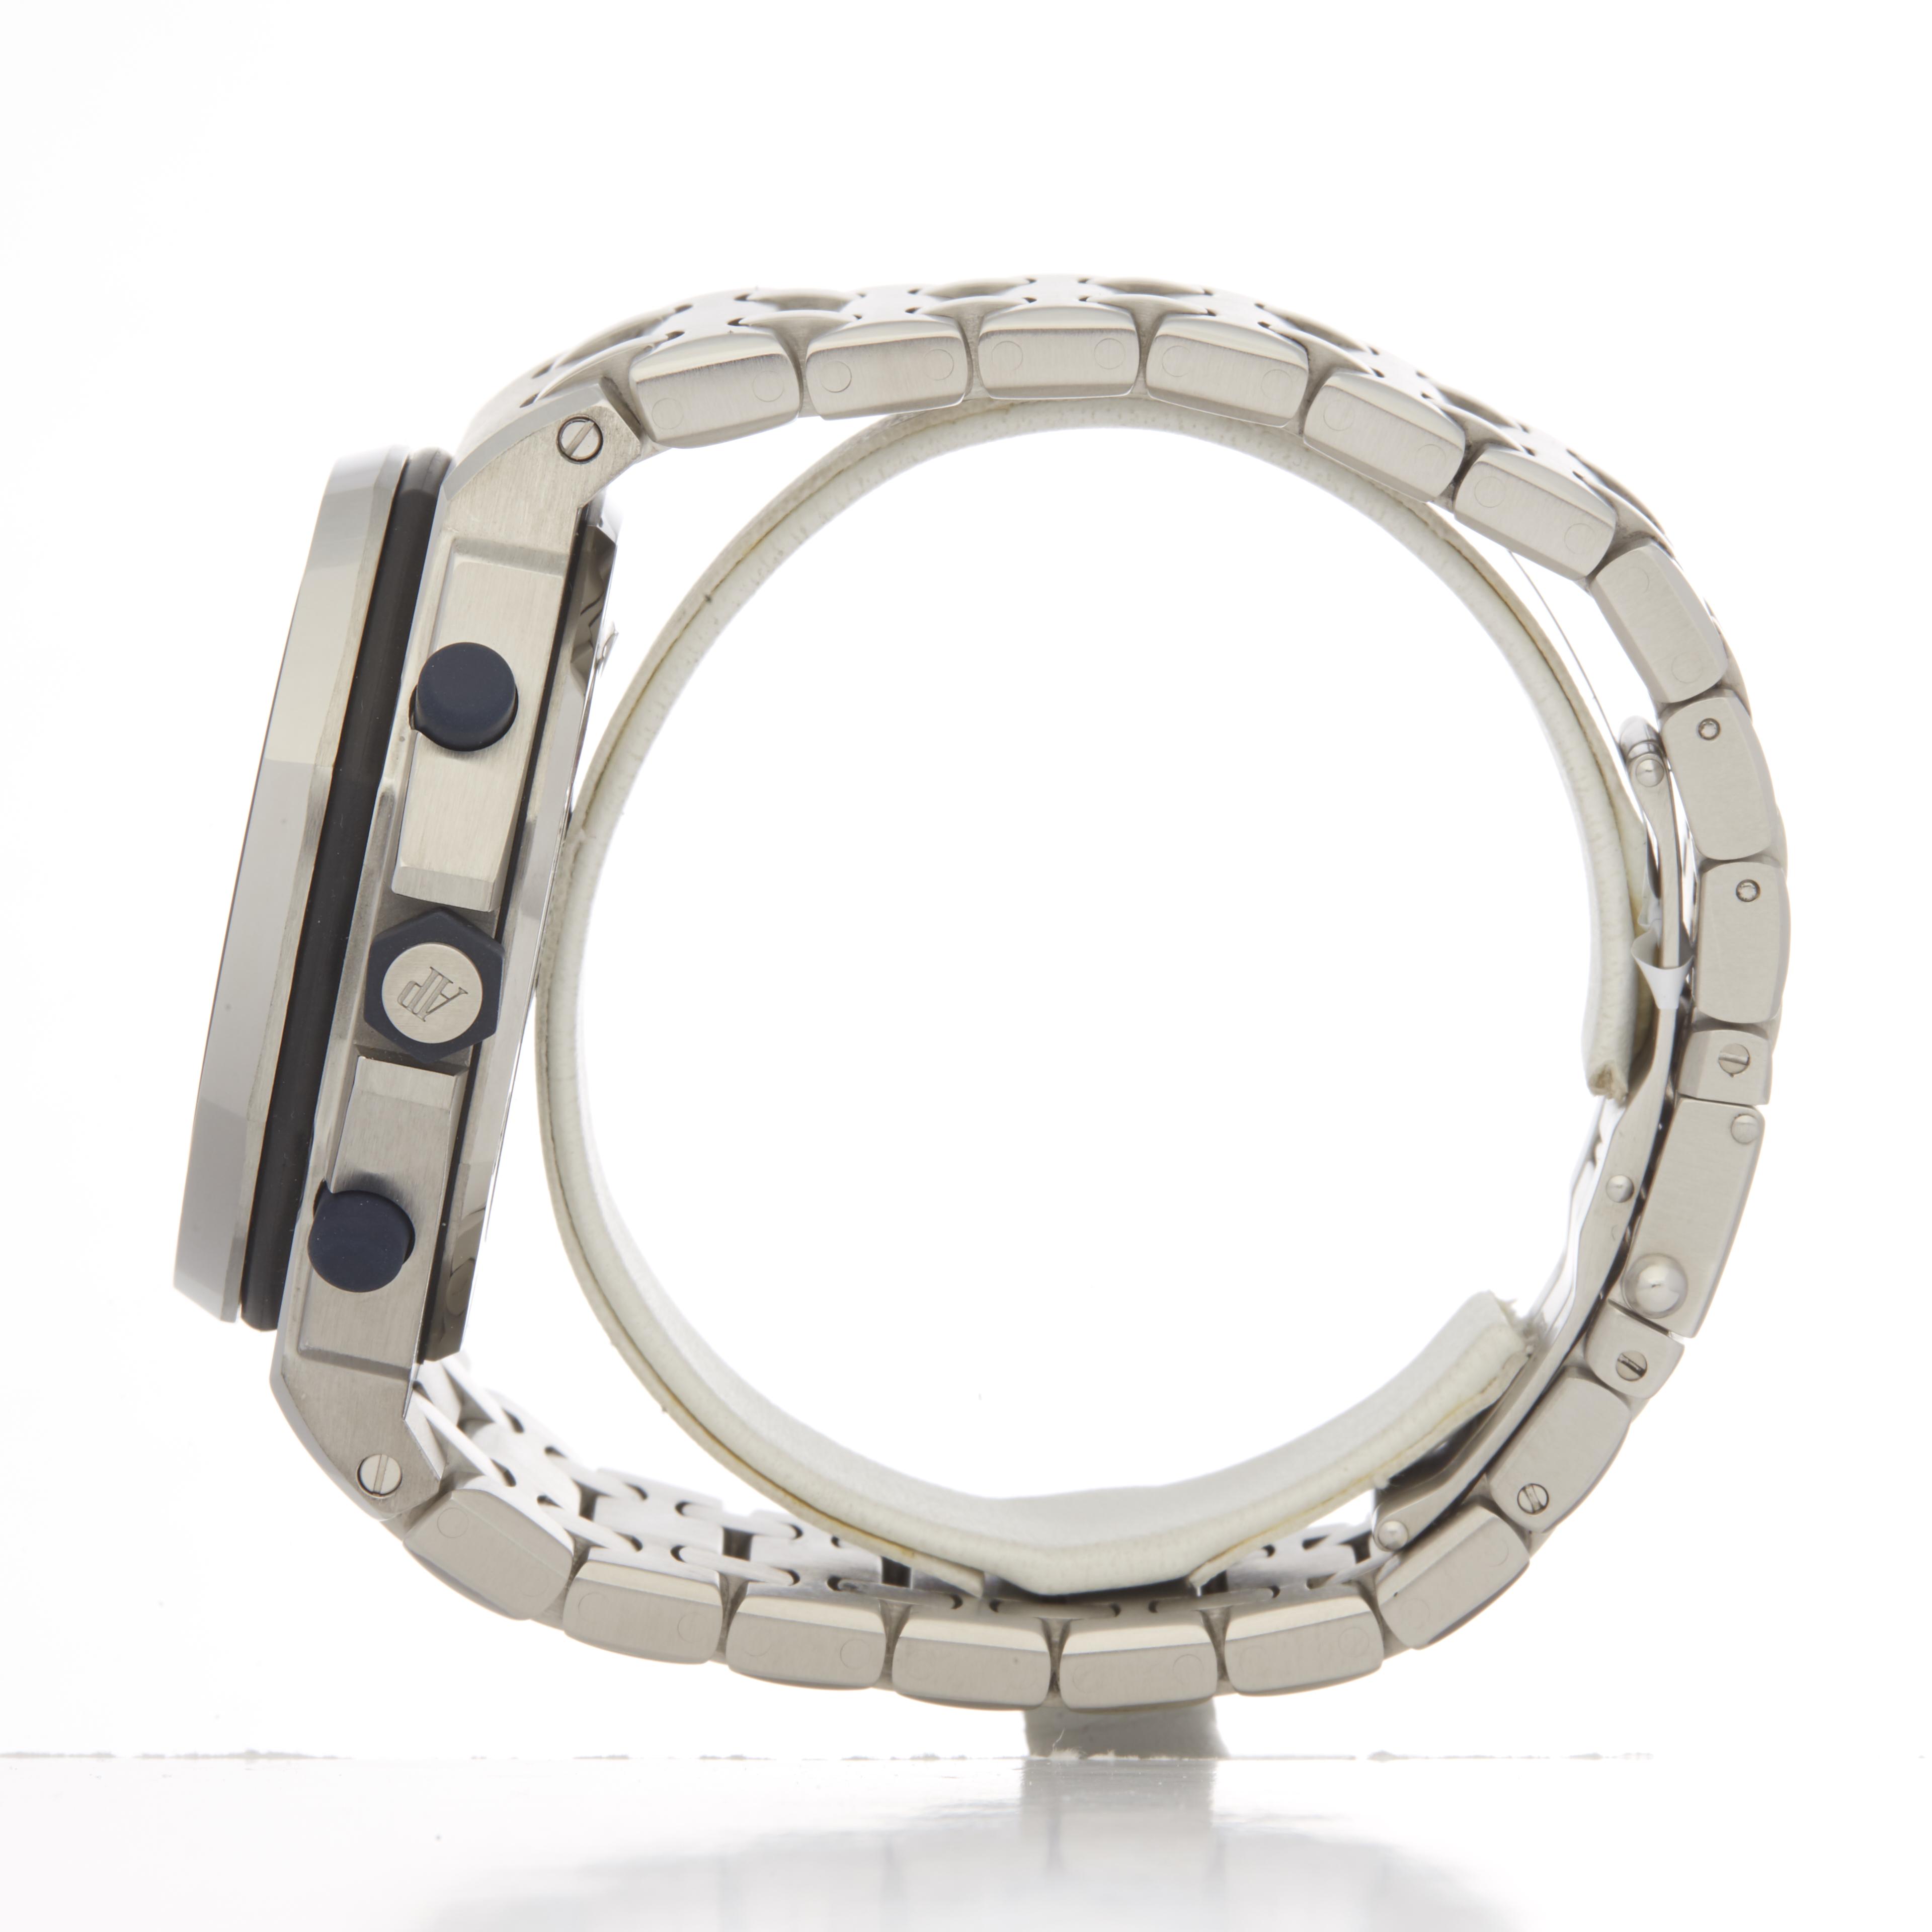 Audemars Piguet Royal Oak Offshore 25721ST/O/1000ST/01 Men Stainless Steel The Beast Chronograph - Image 6 of 6